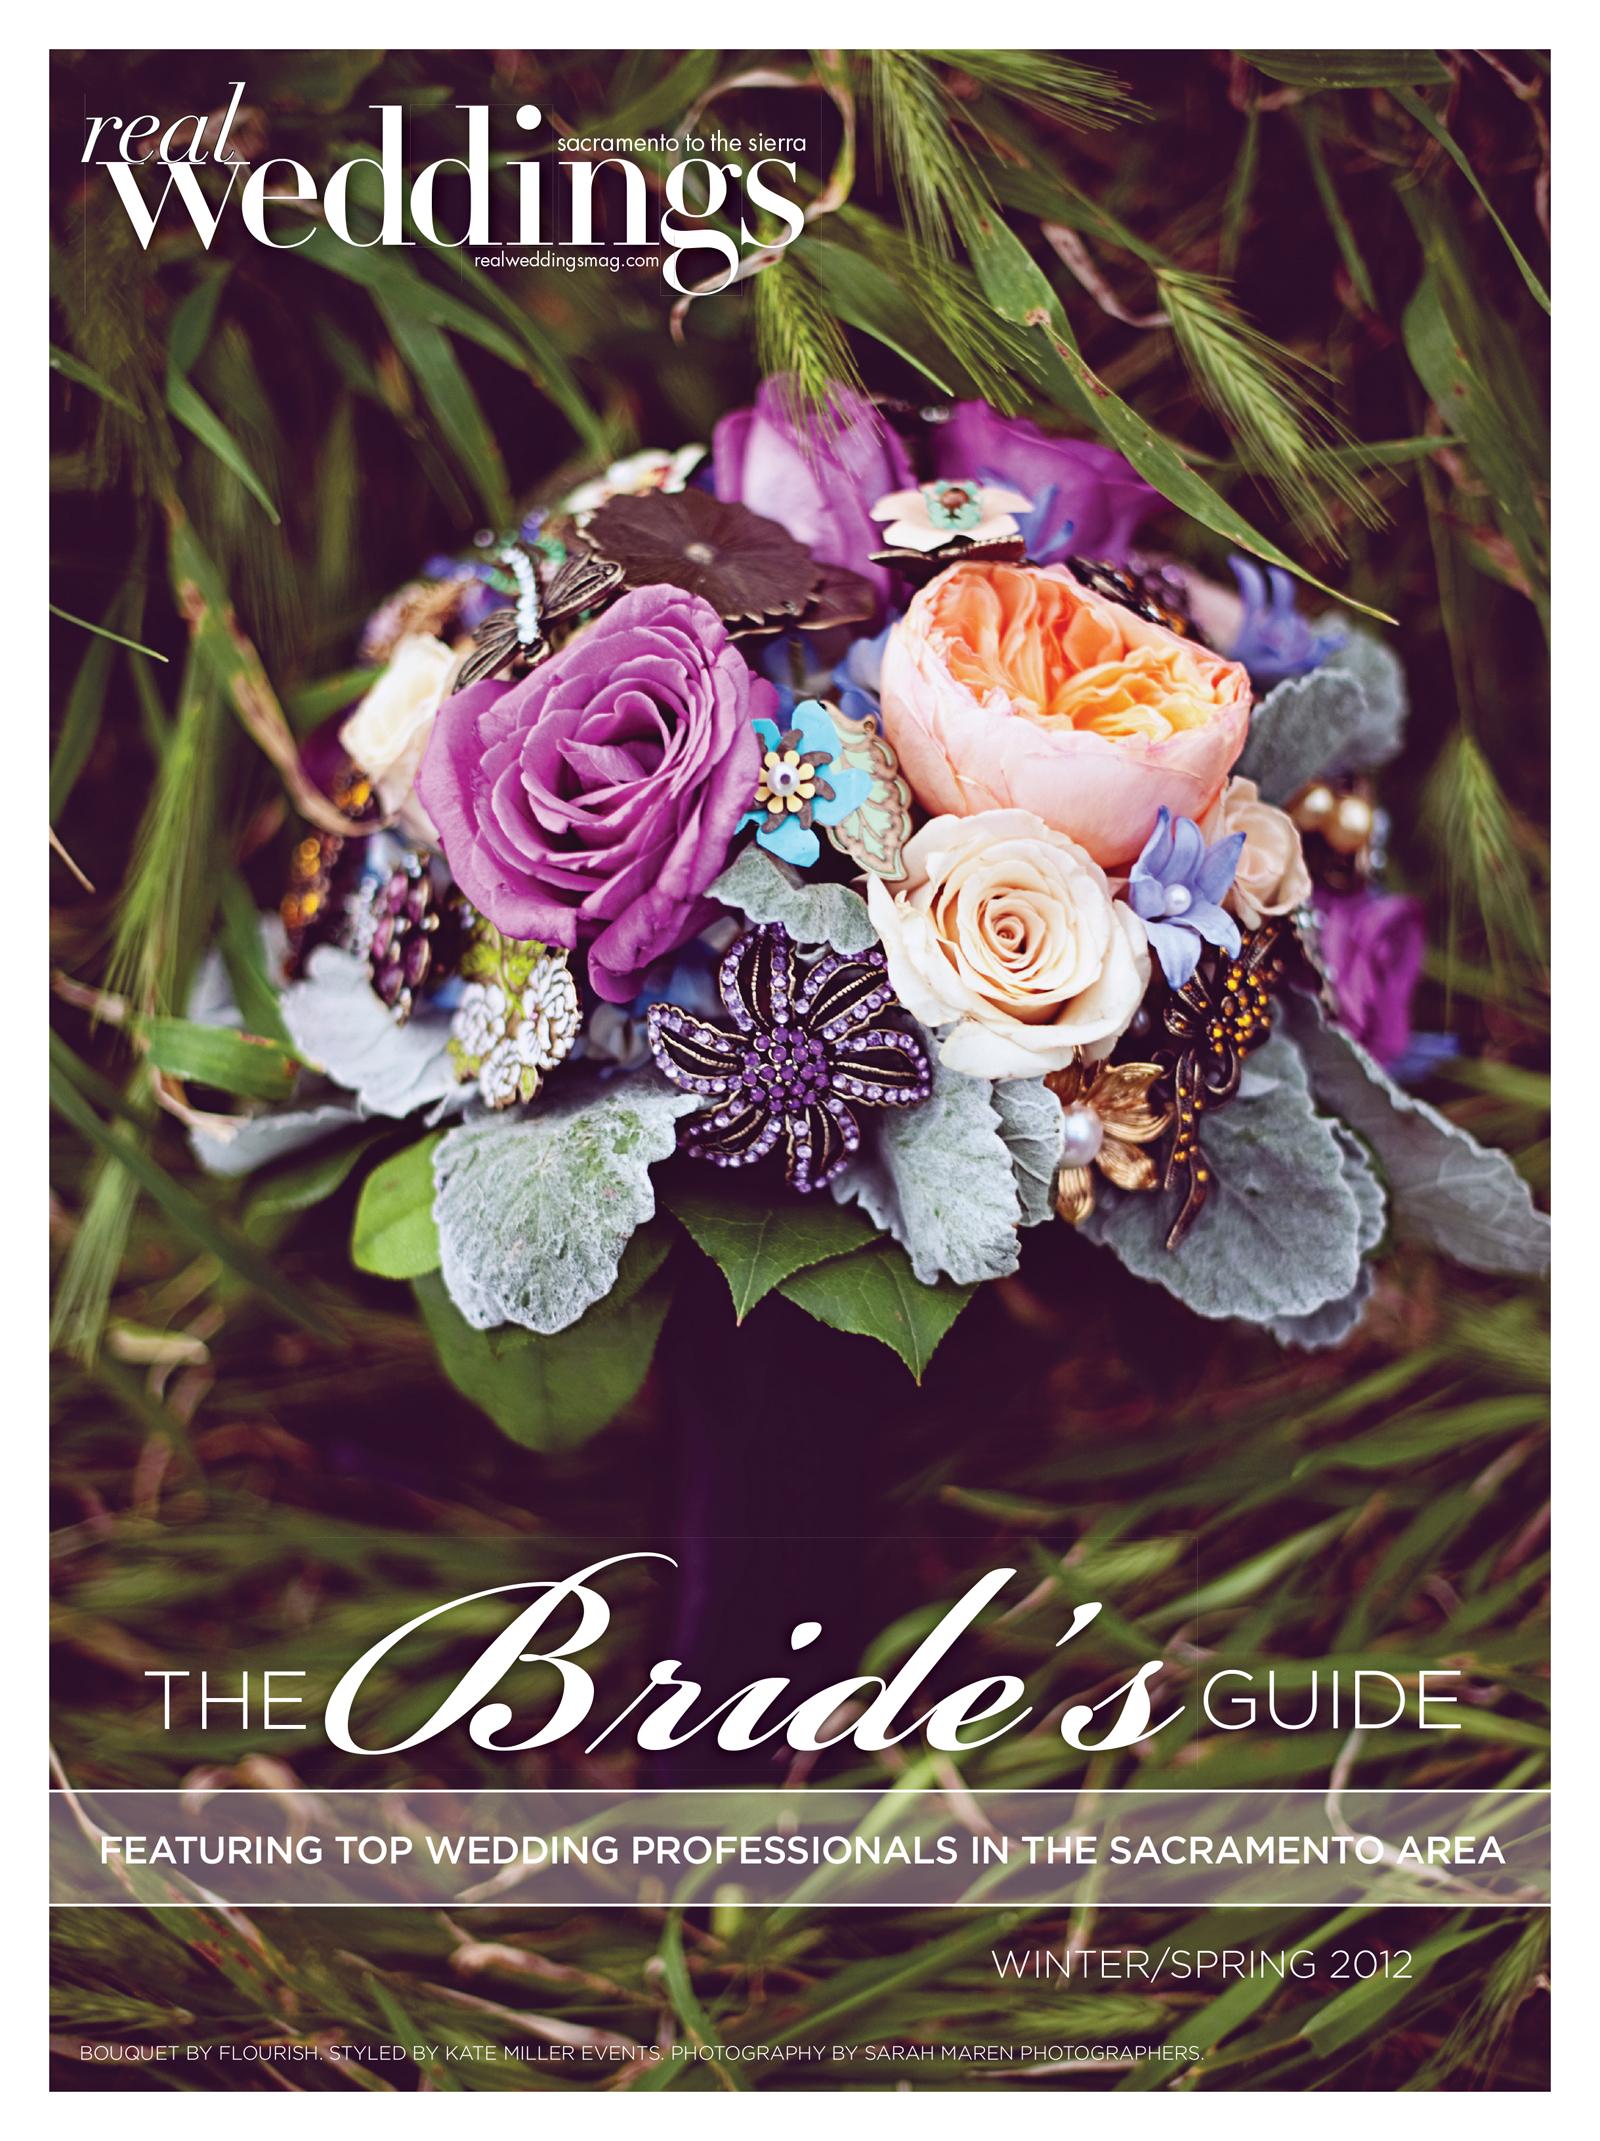 THE-BRIDES-GUIDE-BY-REAL-WEDDINGS-MAGAZINE-SACRAMENT0-TAHOE-BEST-VENDORS-TIPS-INSPIRATION-SARAH-MAREN-KATE-WHELAN-FLOURISH